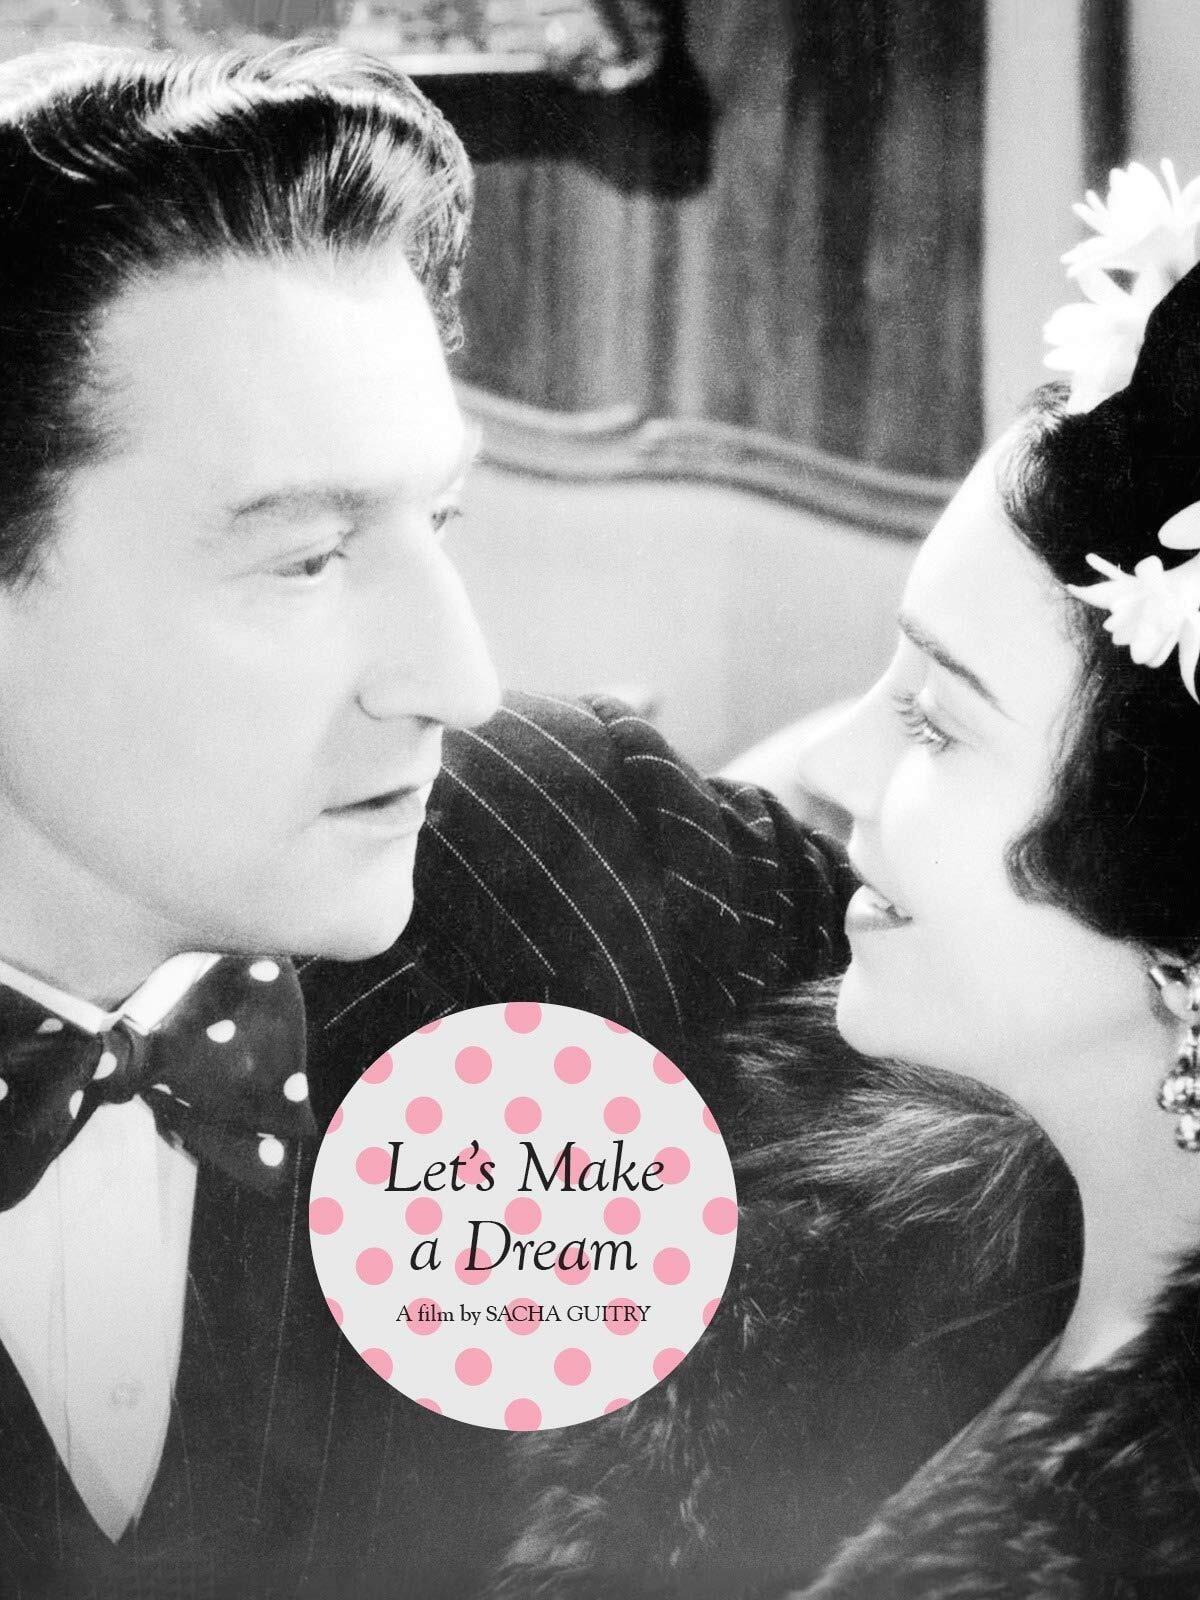 Let's Make a Dream